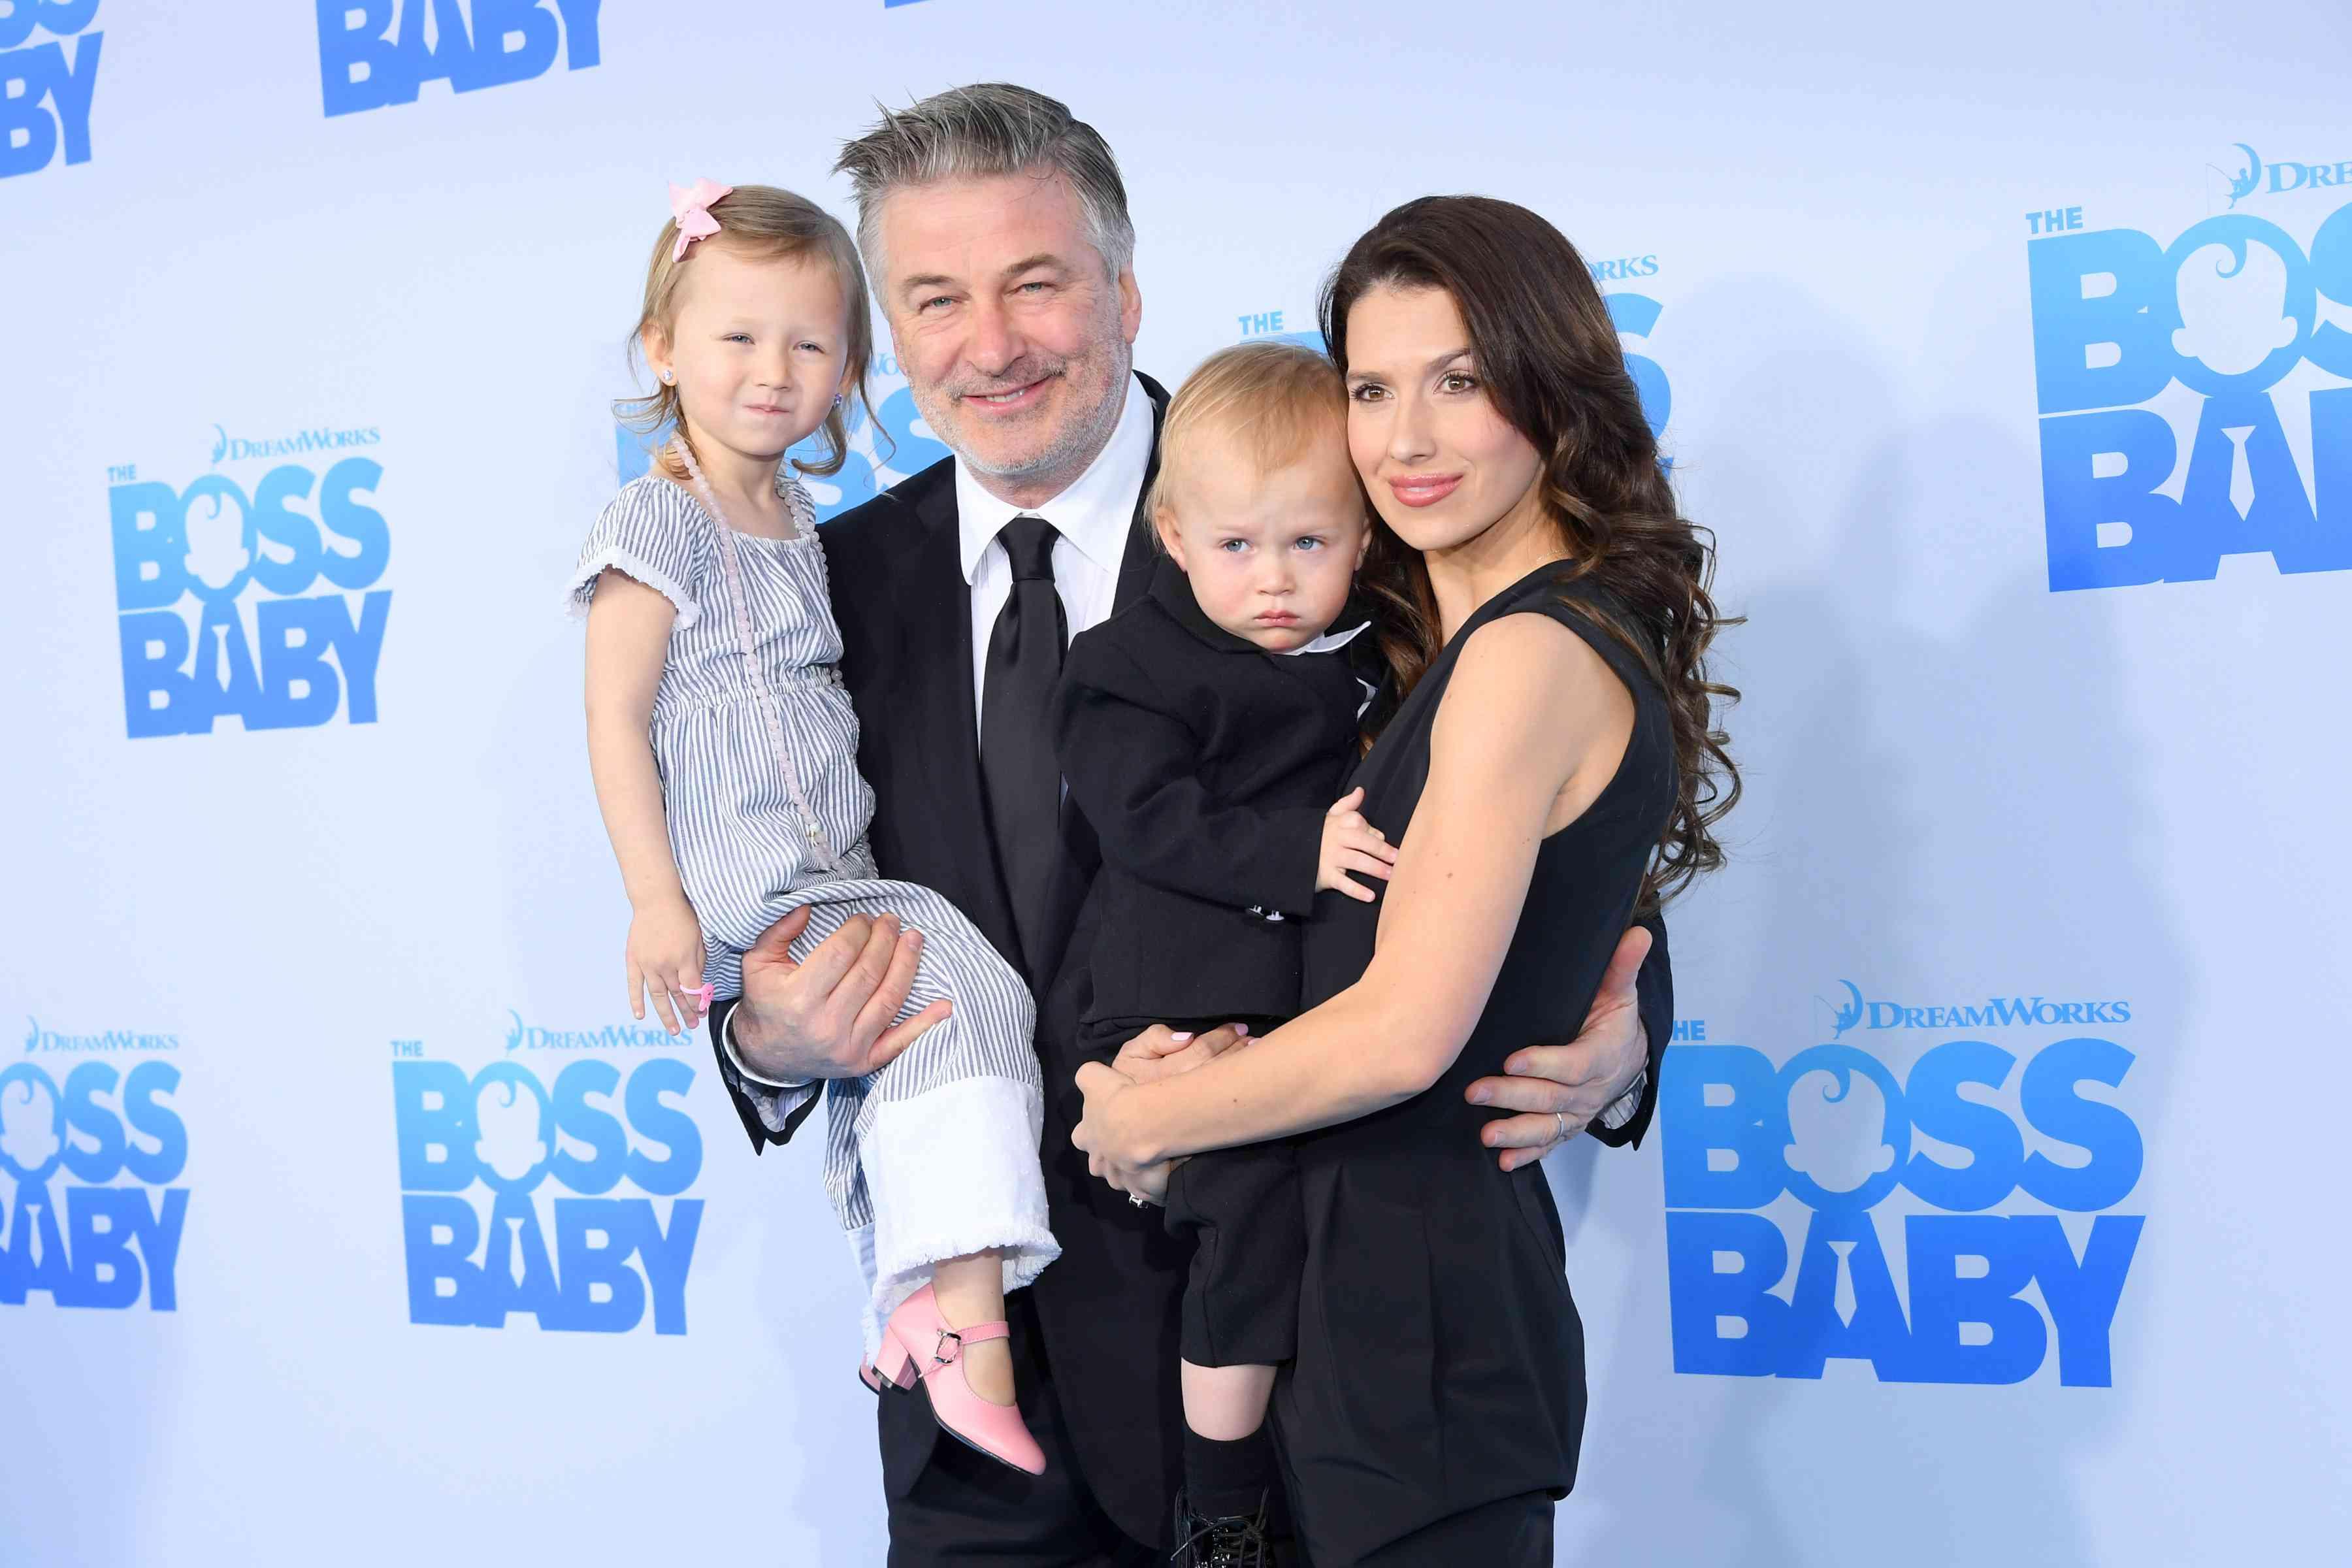 Alec and Hilaria Baldwin and kids